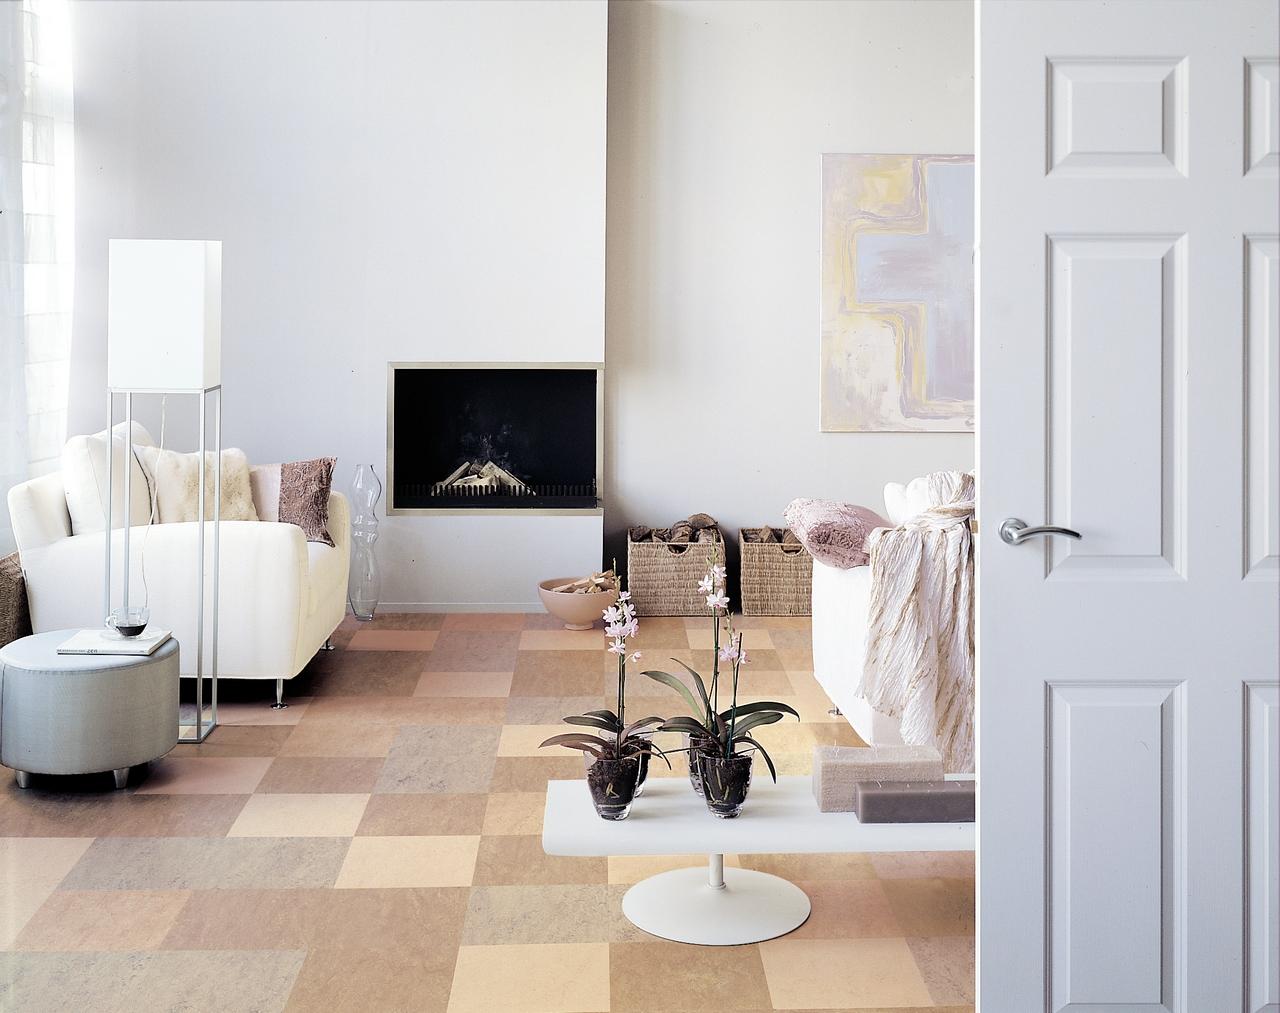 17 motif keramik lantai ruang tamu sederhana terbaru 2017